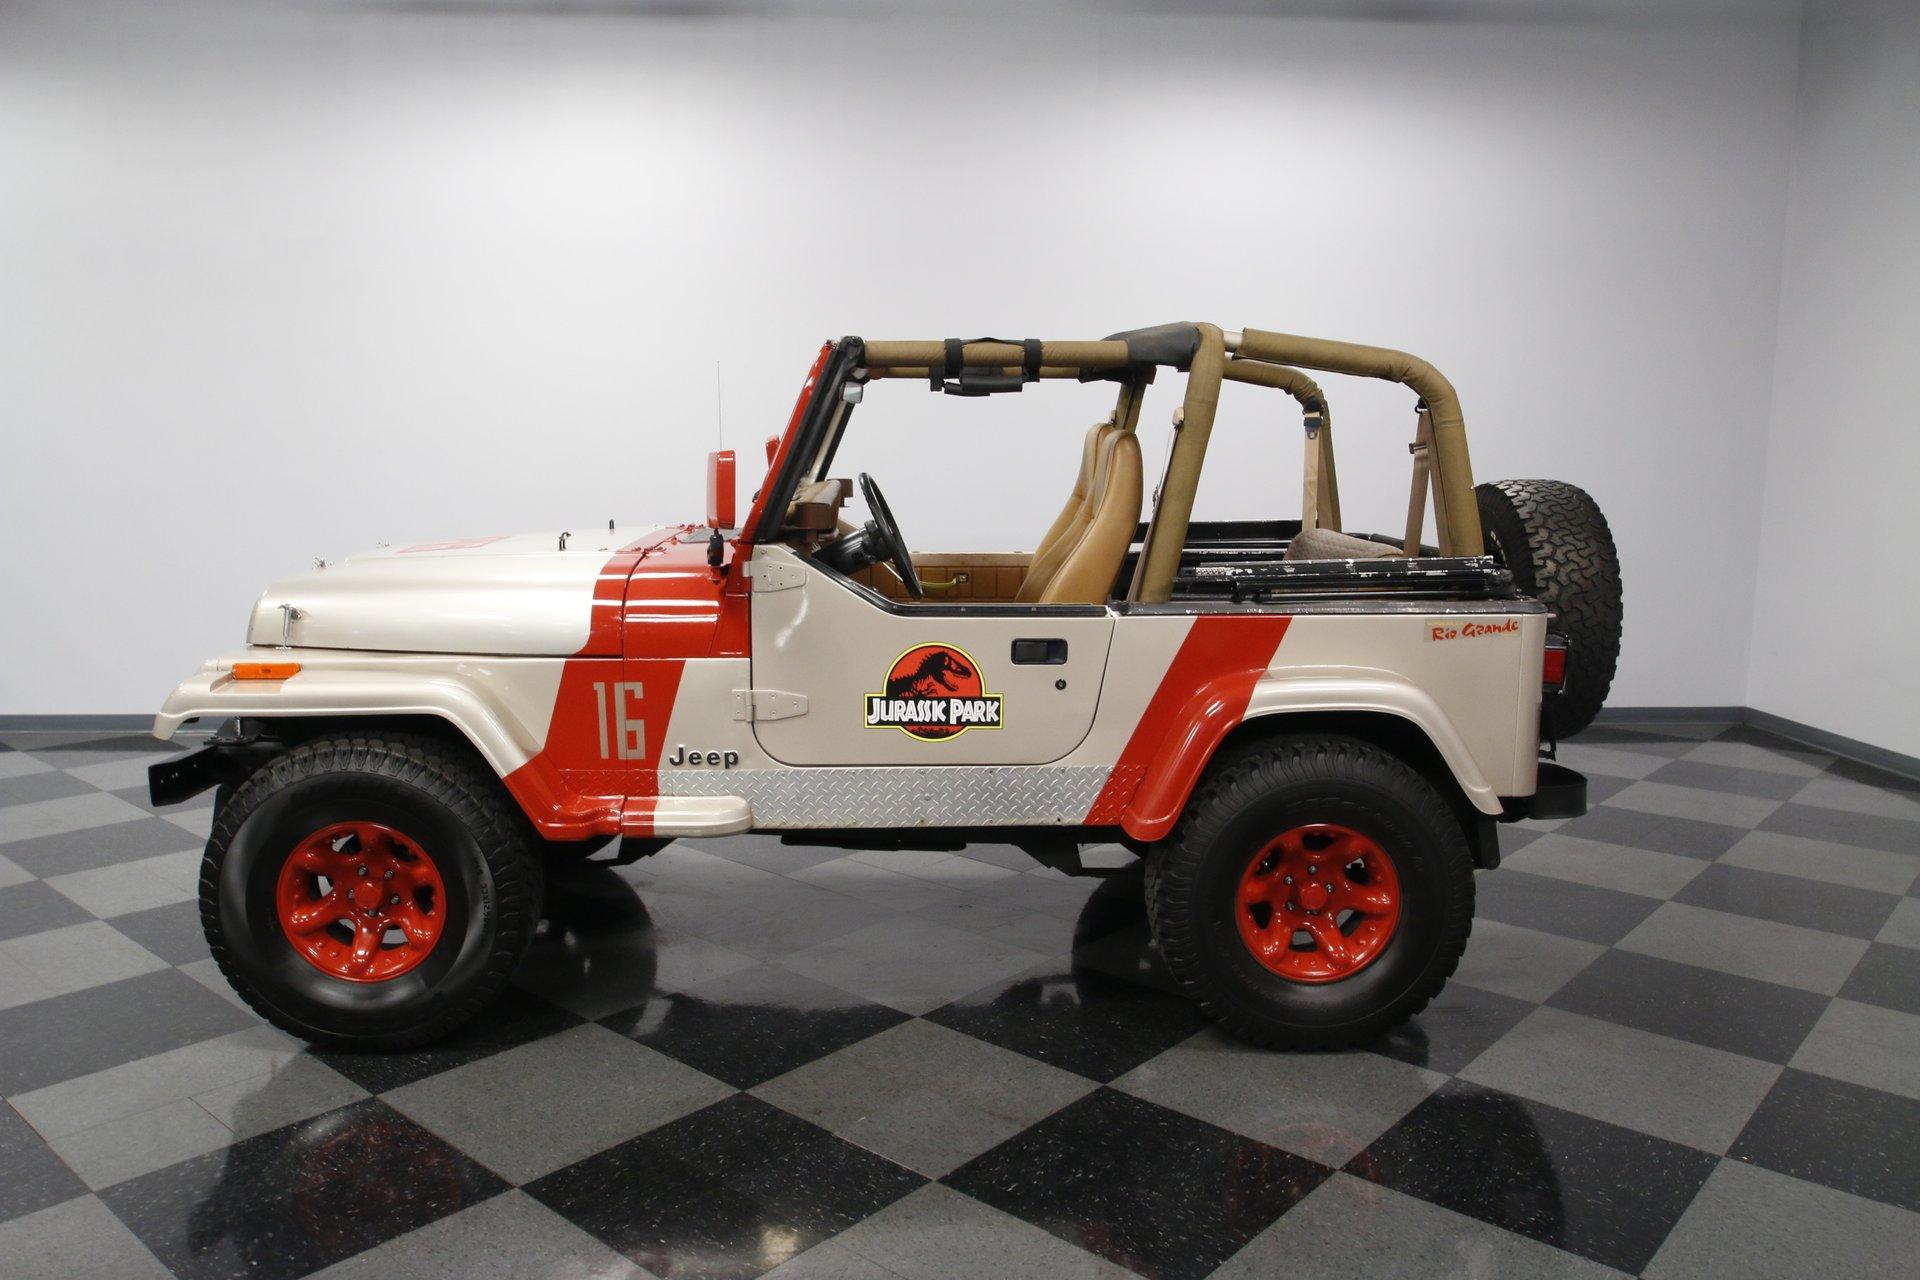 1995 jeep wrangler rio grande jurassic park theme